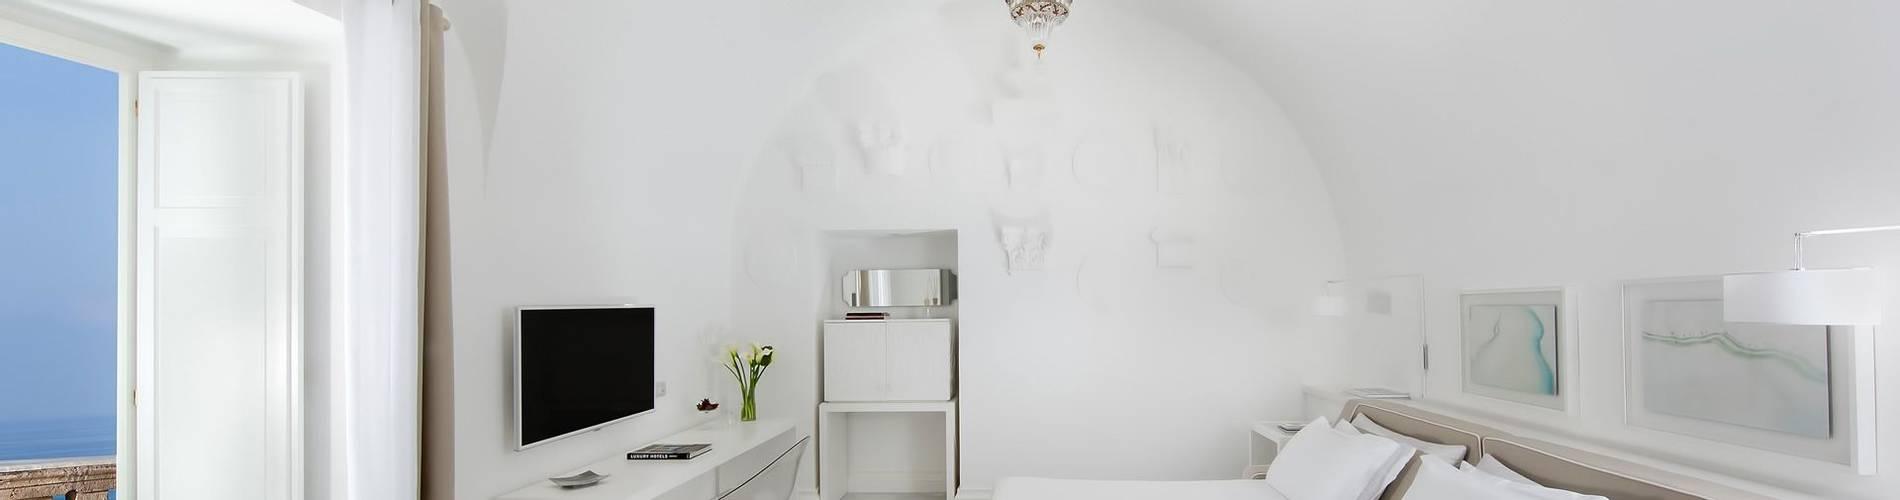 Bellevue Syrene, Sorrento, Italy, Lady Hamilton Suite (2).jpg